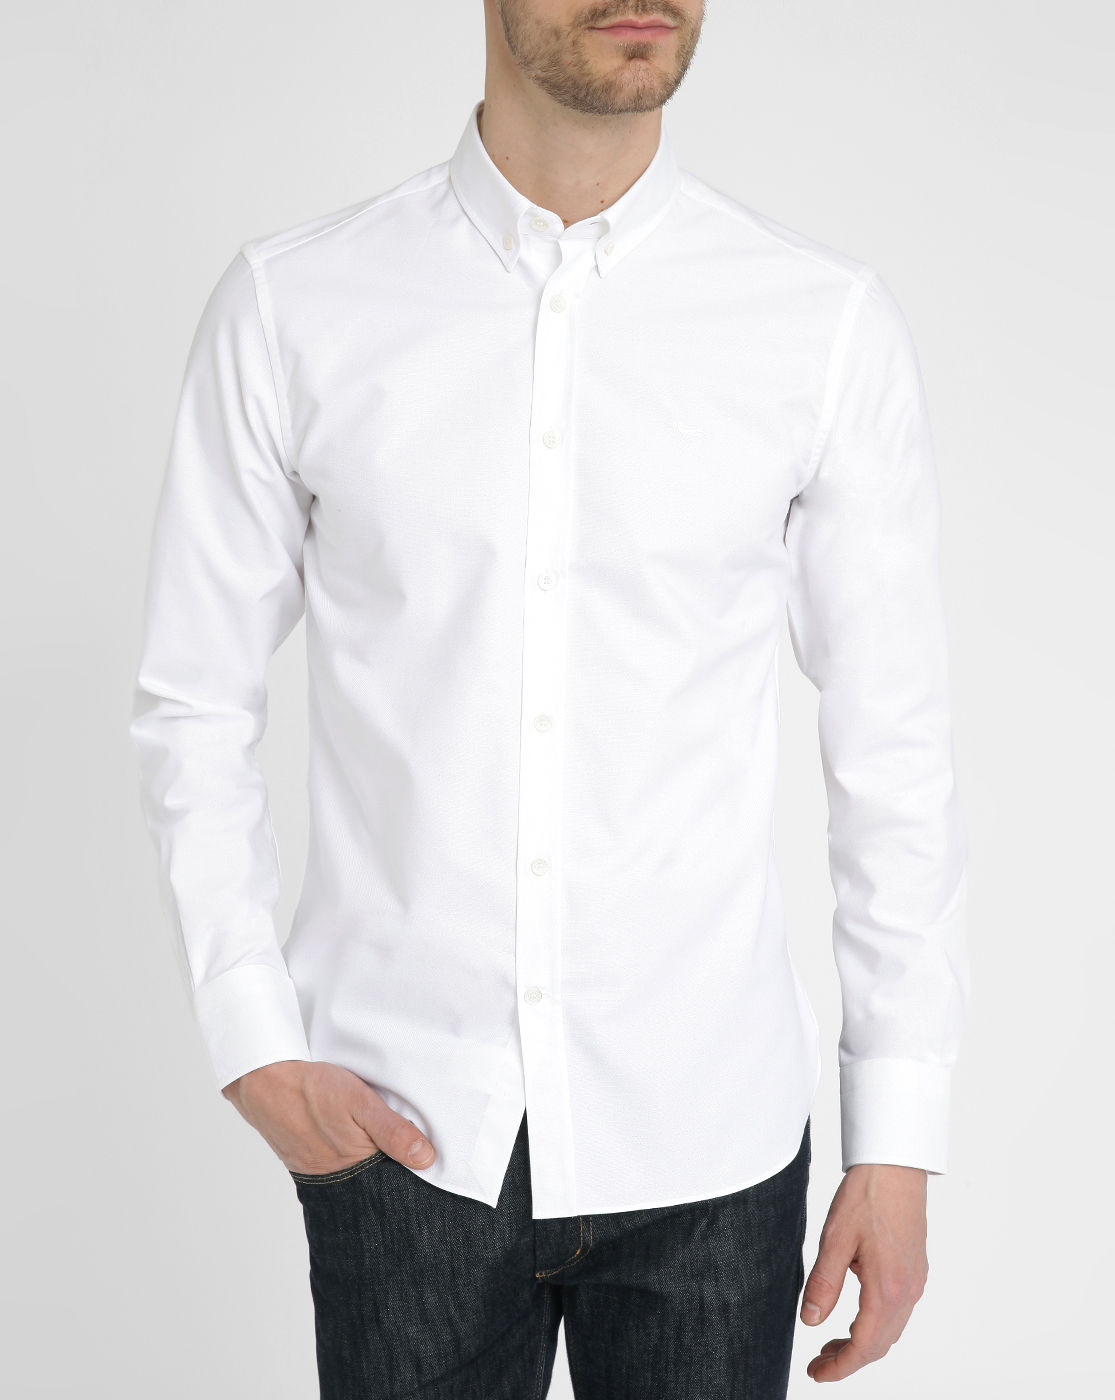 Pin Prada T Shirt Homme Courtes On Pinterest